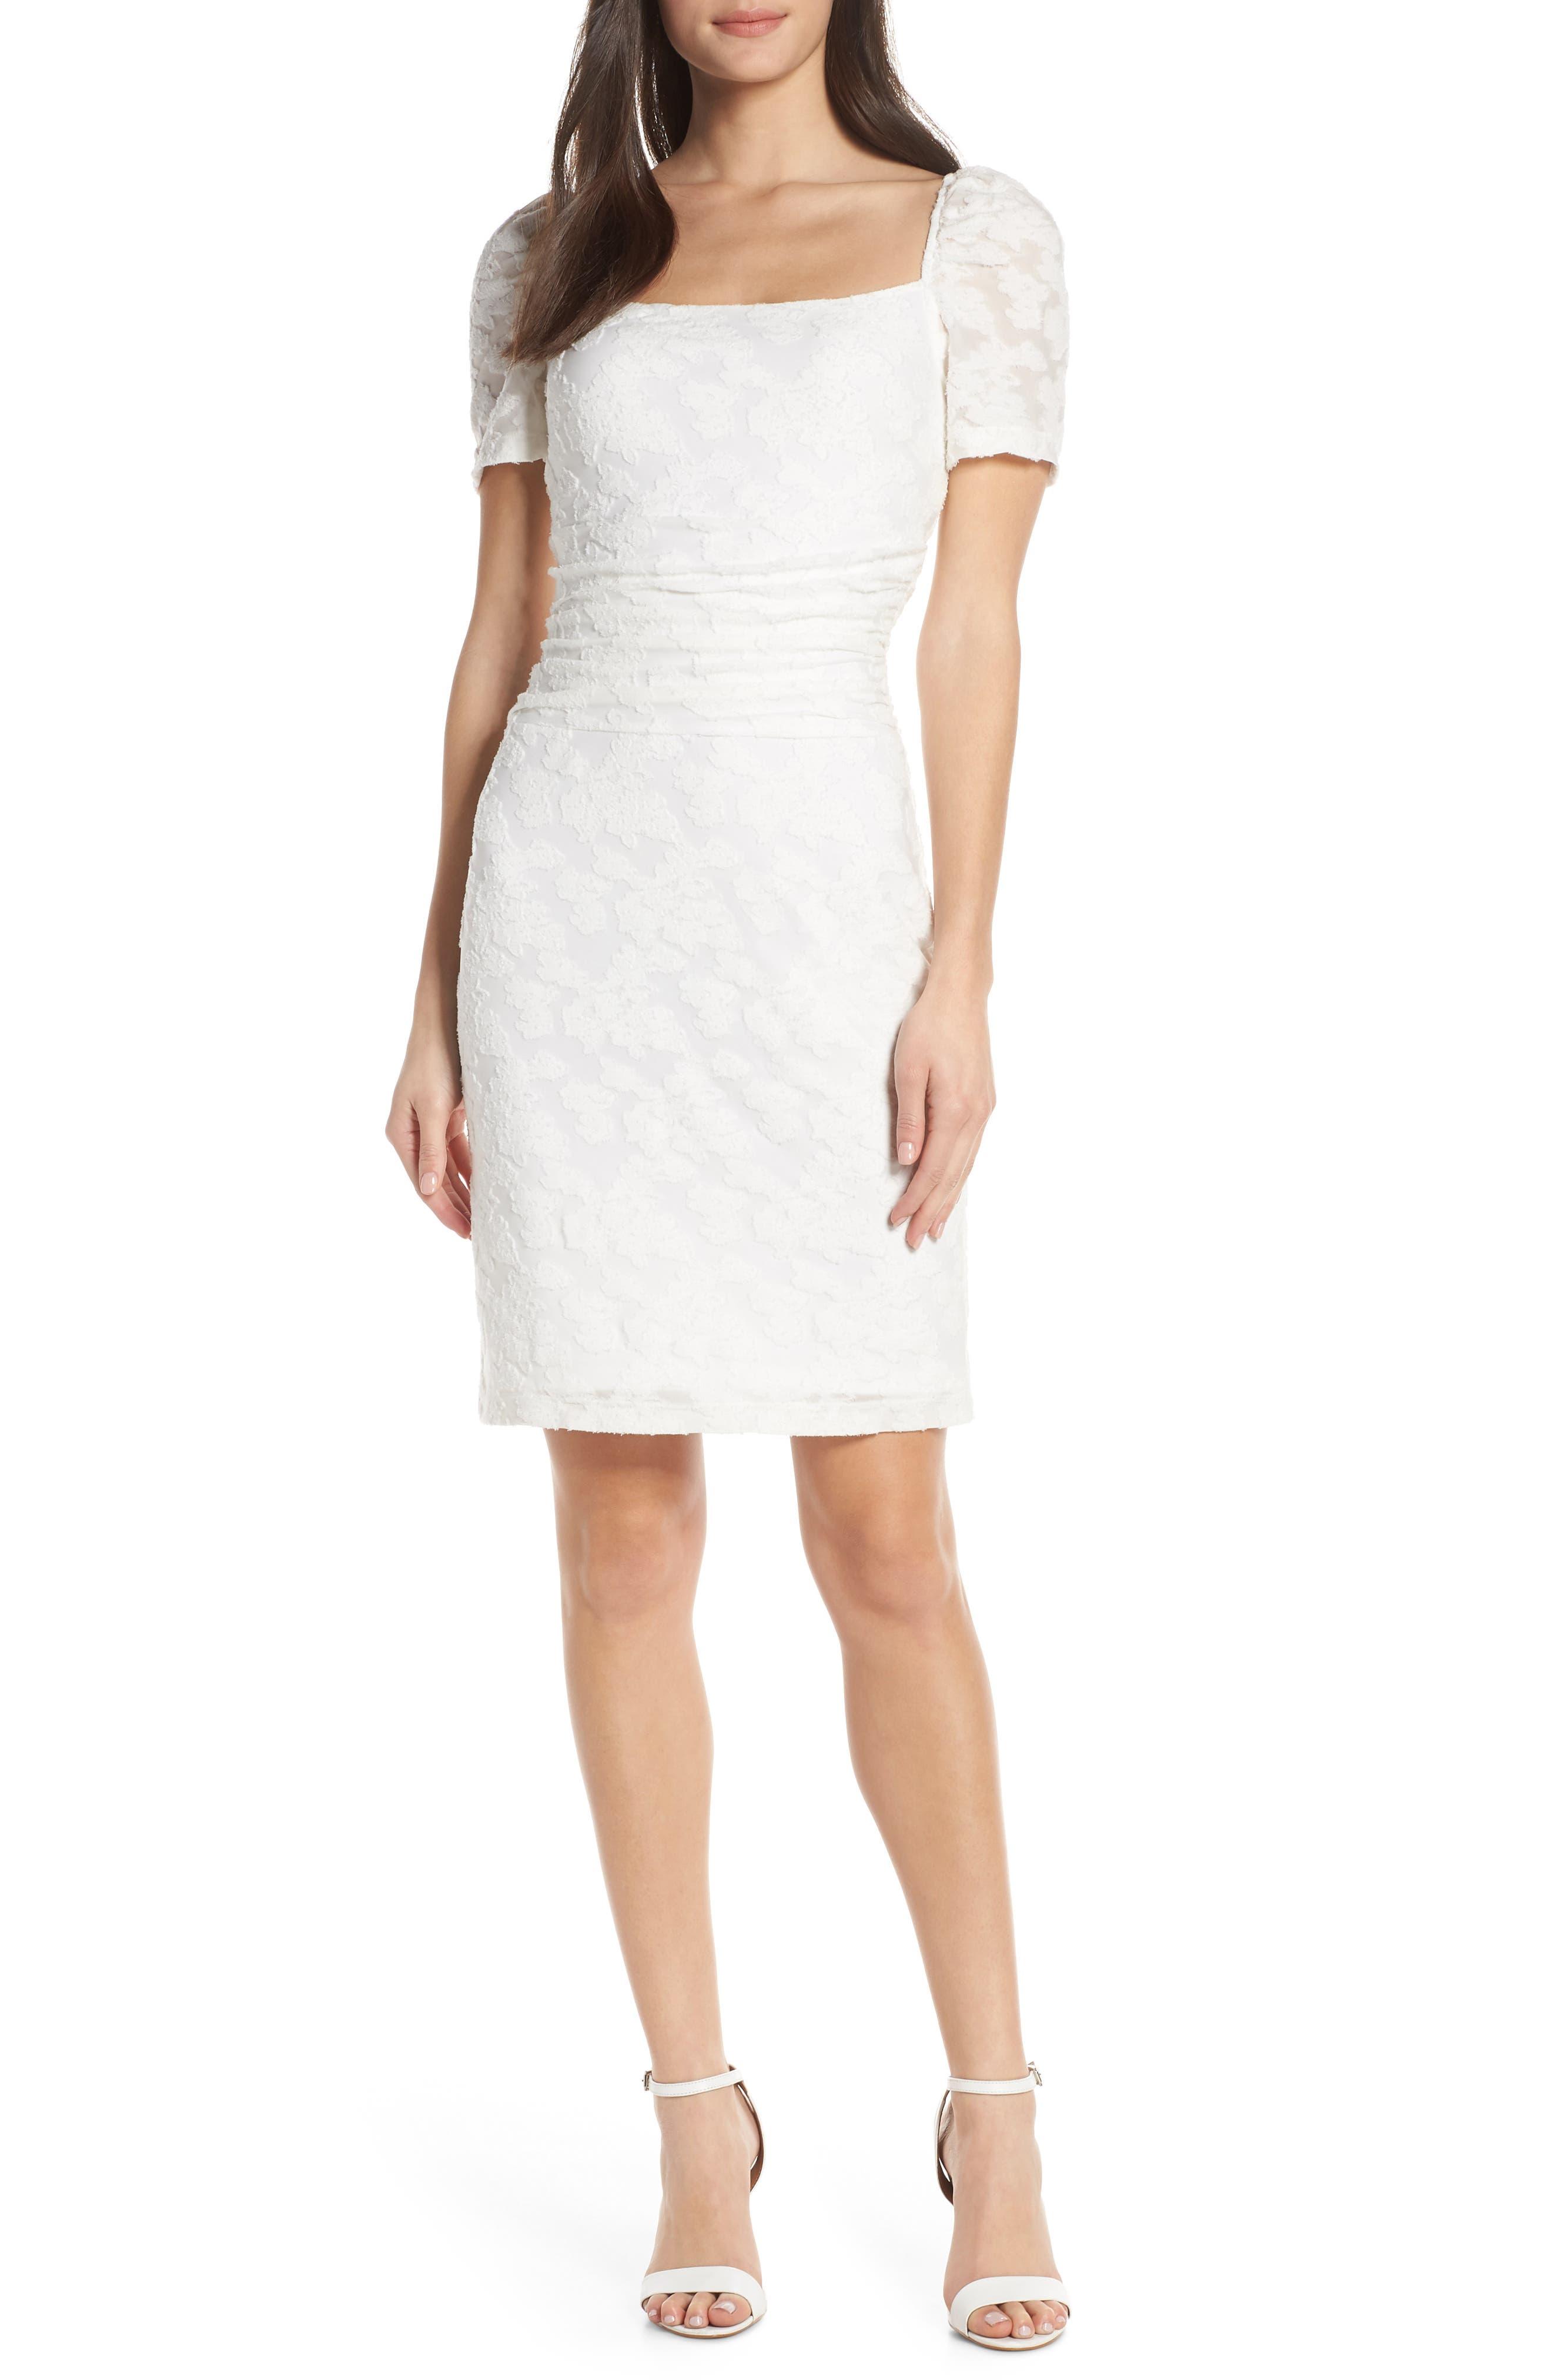 Ali & Jay Big Mistake Short Sleeve Sheath Dress, White